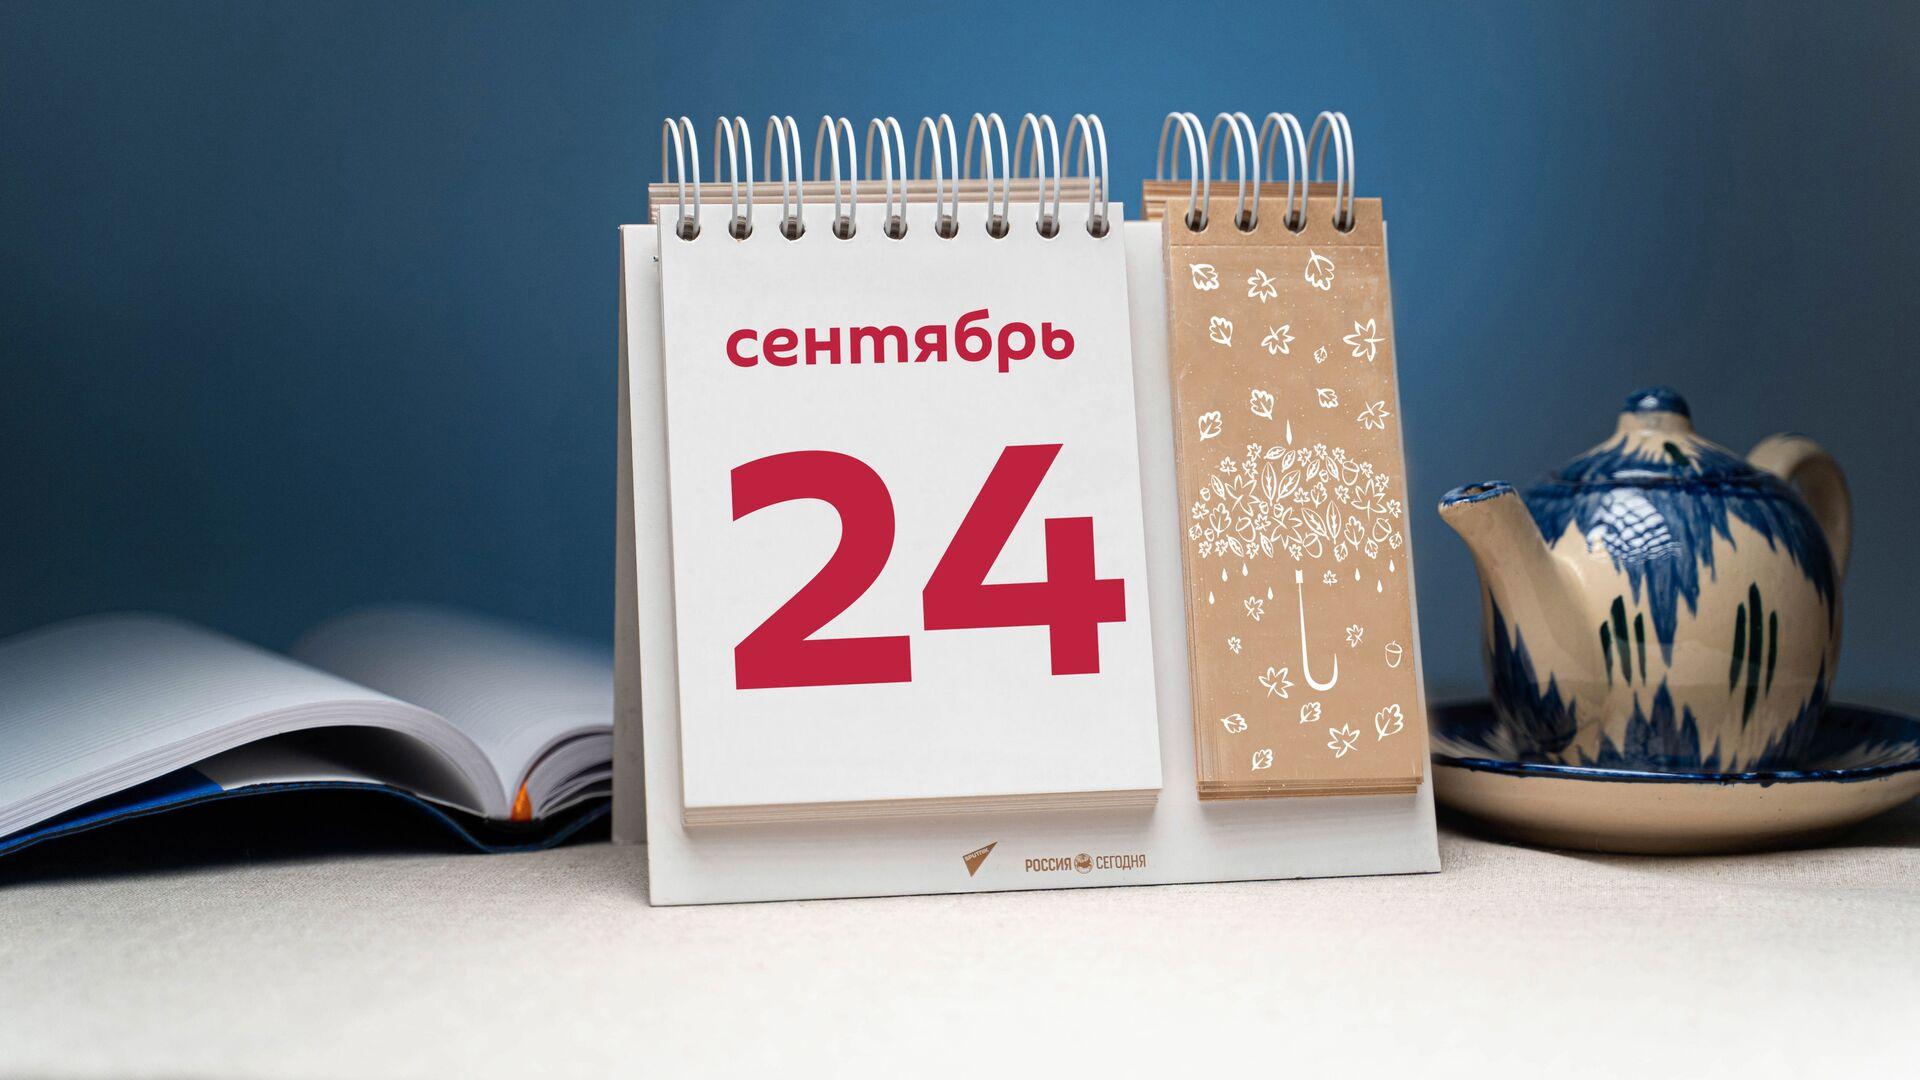 День 24 сентября - Sputnik Тоҷикистон, 1920, 24.09.2021